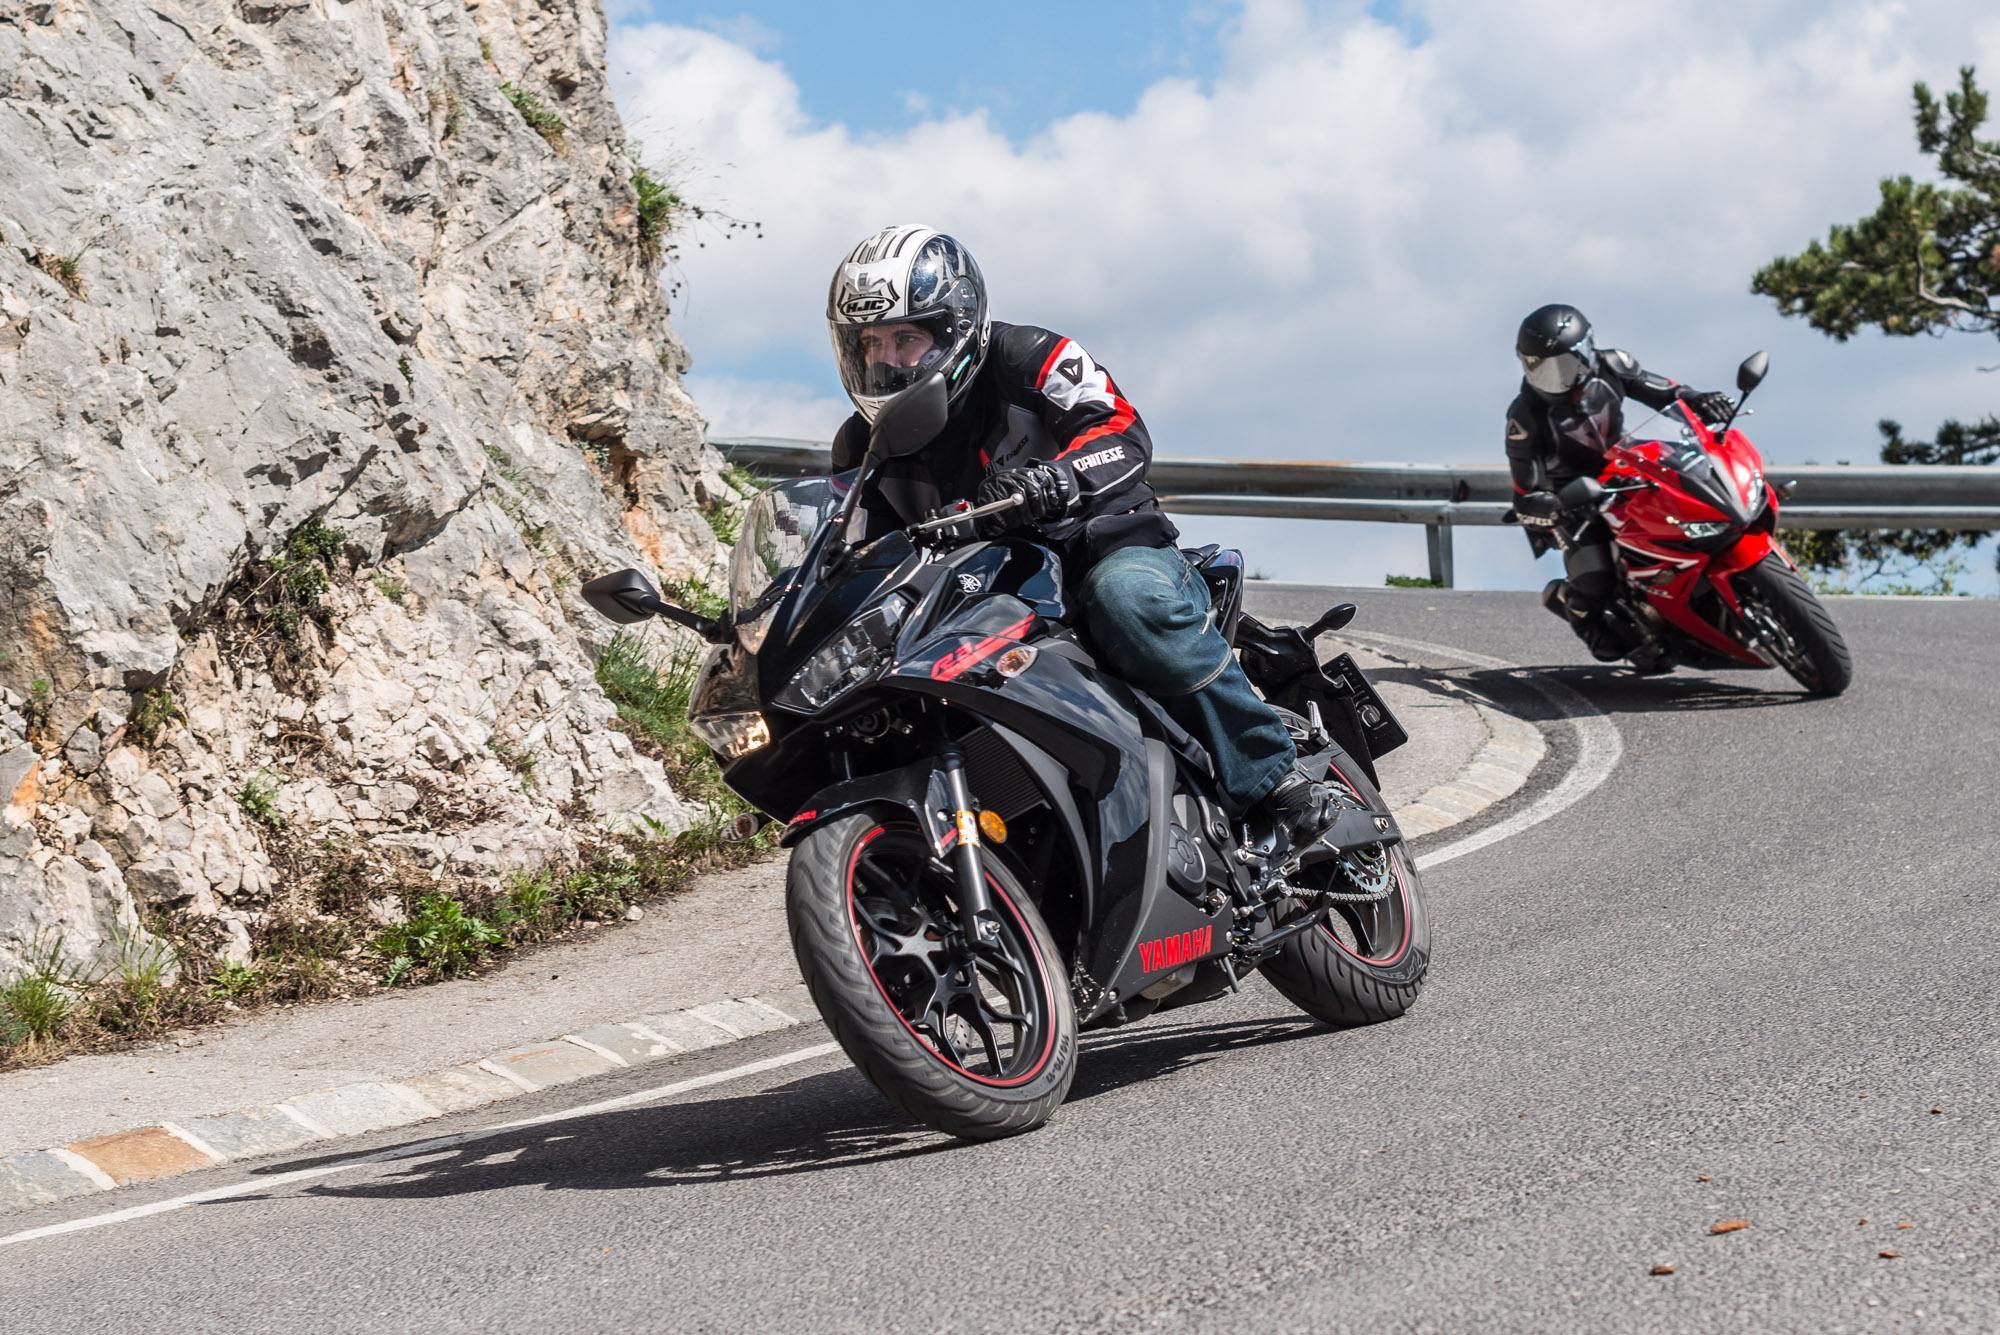 A2 Vergleichstest: Honda CBR500R vs. Yamaha YZF-R3 Foto